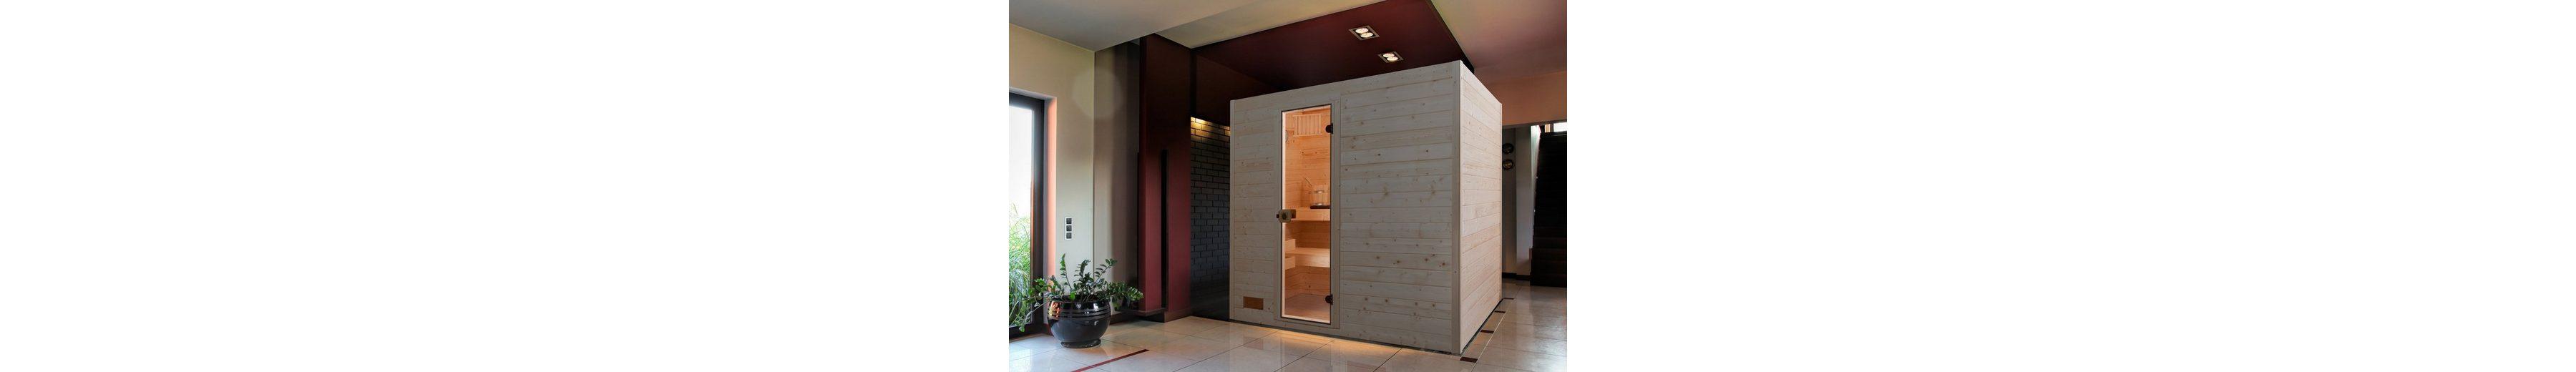 Sauna »Vaasa 2«, 237/187/203,5 cm, 38 mm, 7,5-KW-Ofen